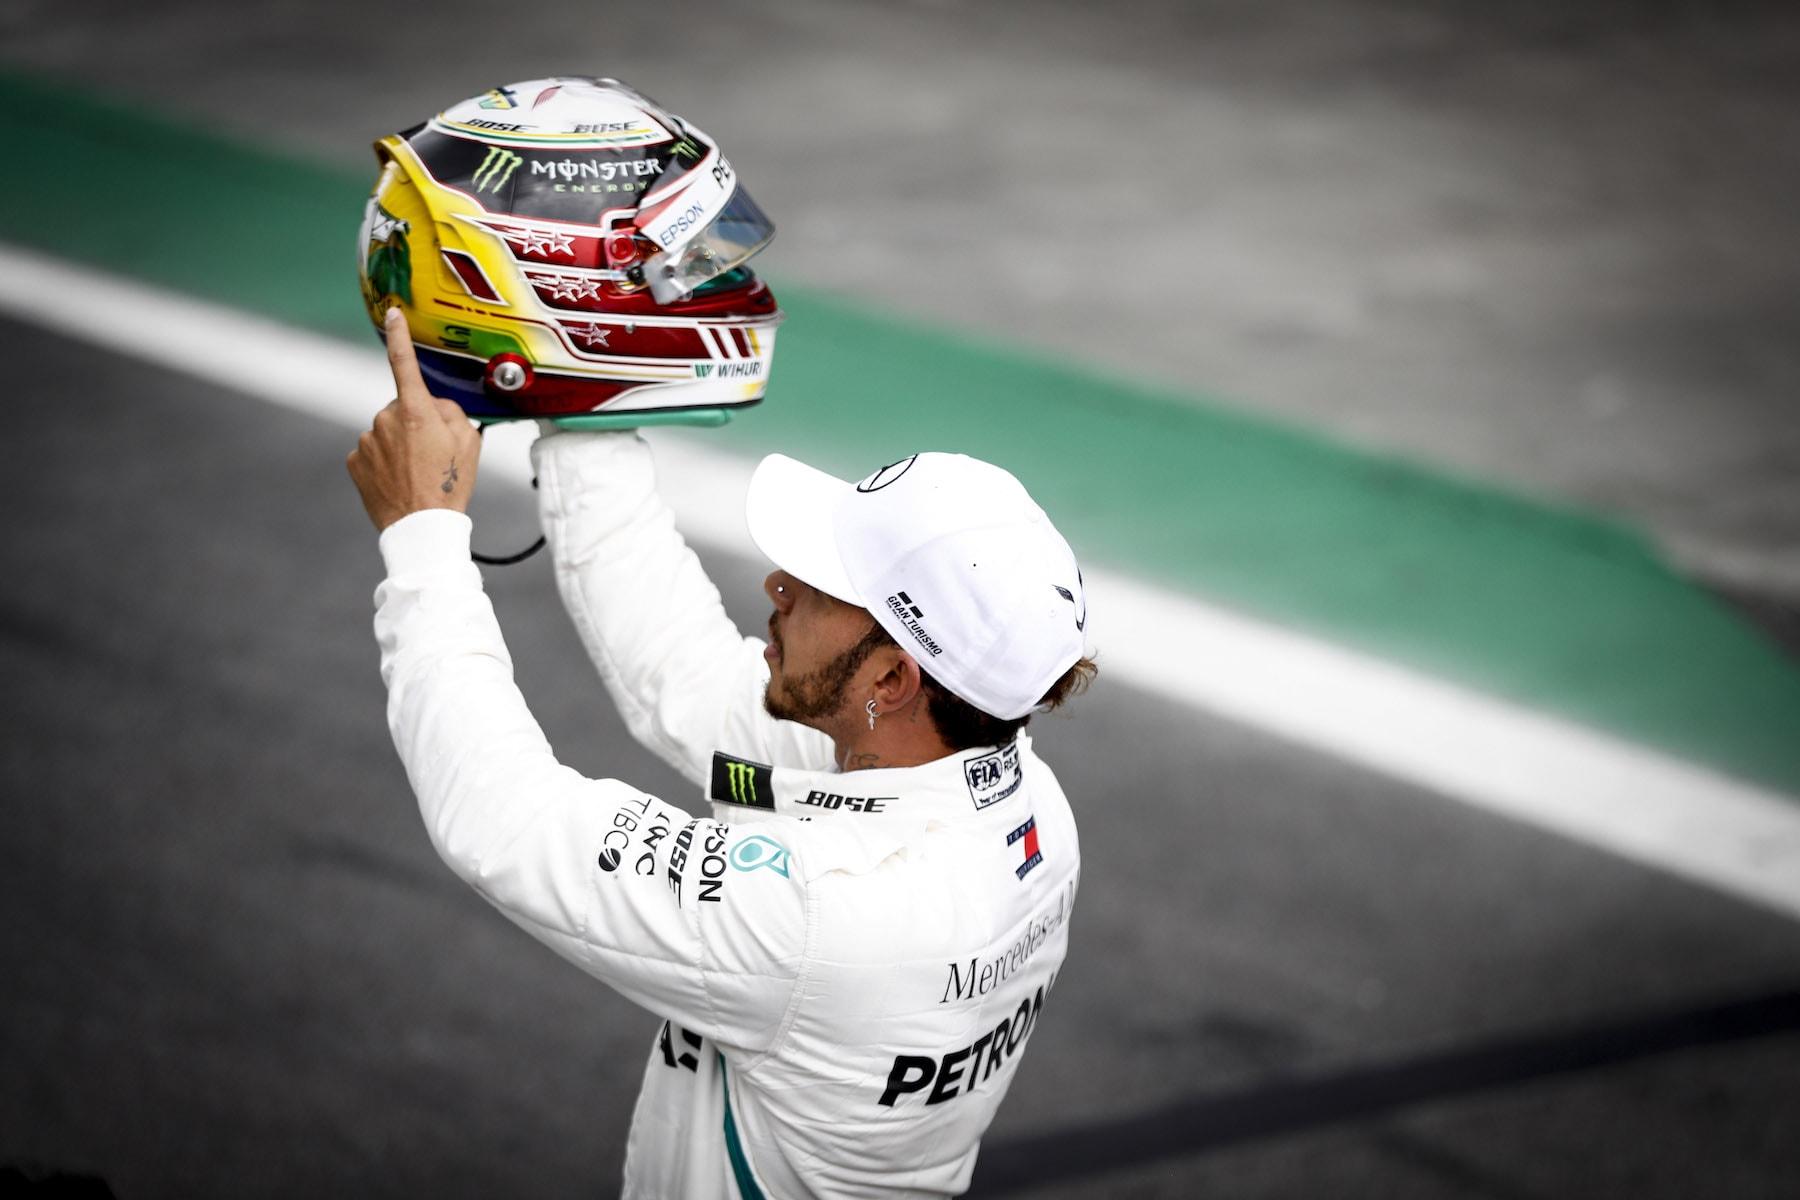 4 2018 Lewis Hamilton | Mercedes W09 | 2018 Brazilian GP Q3 Pole 3 copy.jpg